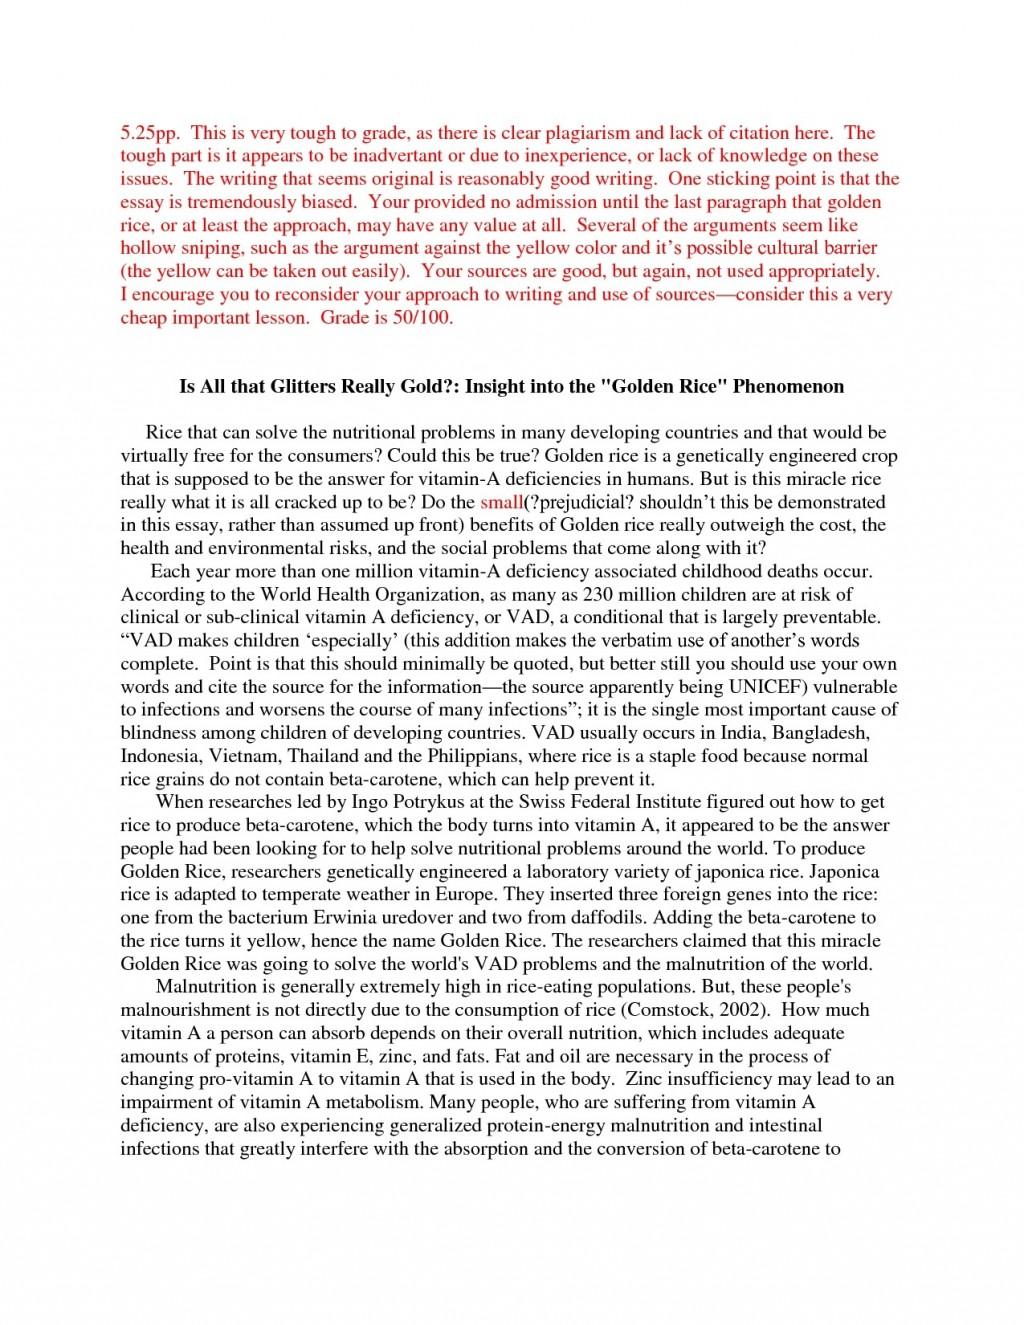 012 Essay Example Essays Examples Selo Yogawithjo Co Of College Wondrous Duke Mba 2018 Large